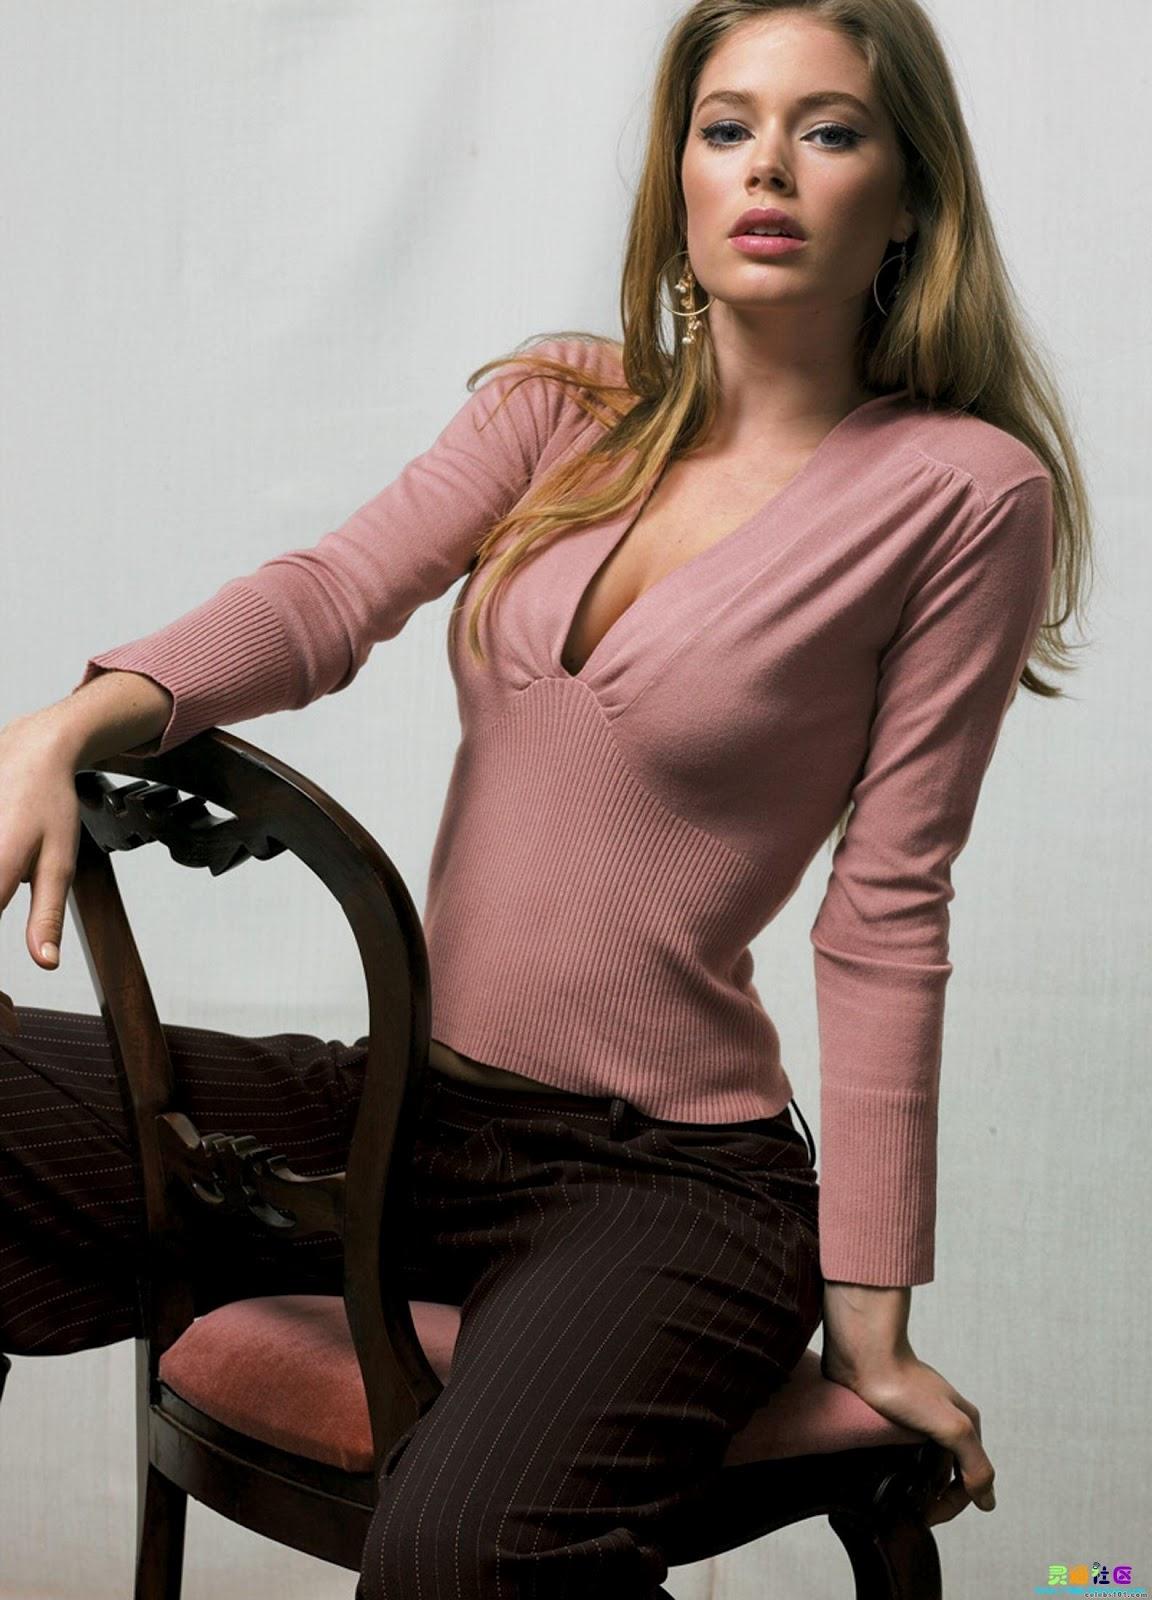 Allwalls: Hot Dutch model and actress Doutzen Kroes Mariah Carey